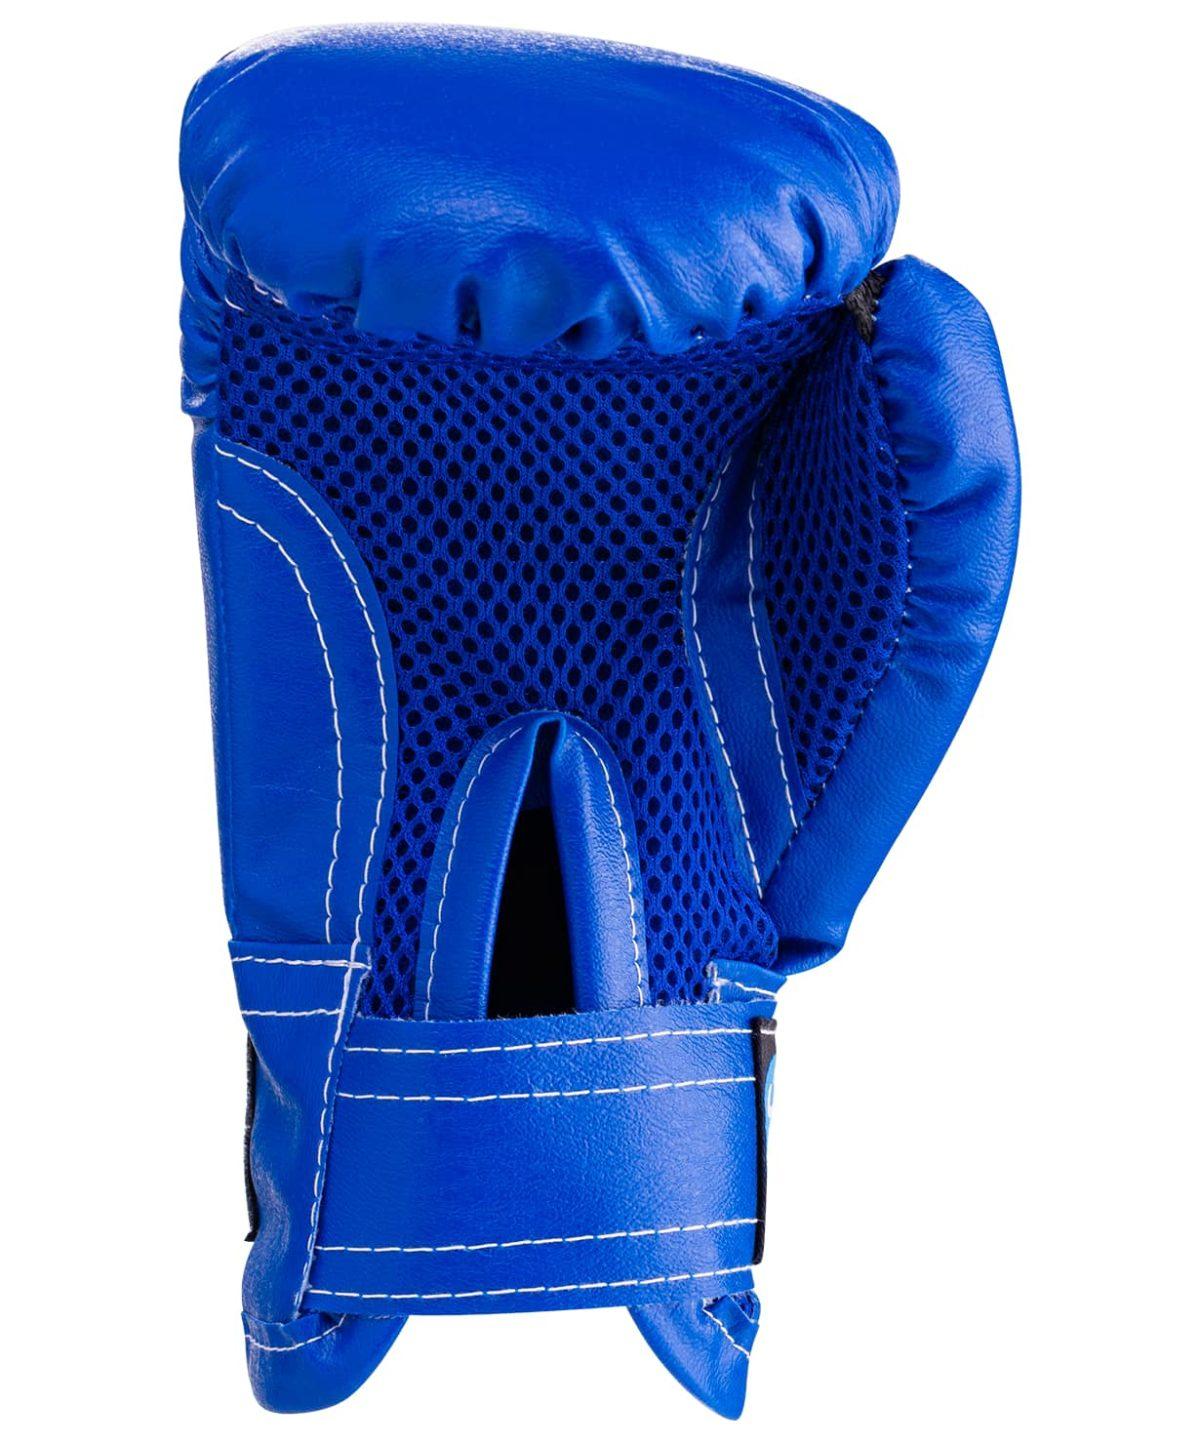 RUSCO Набор для бокса 6oz, к/з  13972 - 4